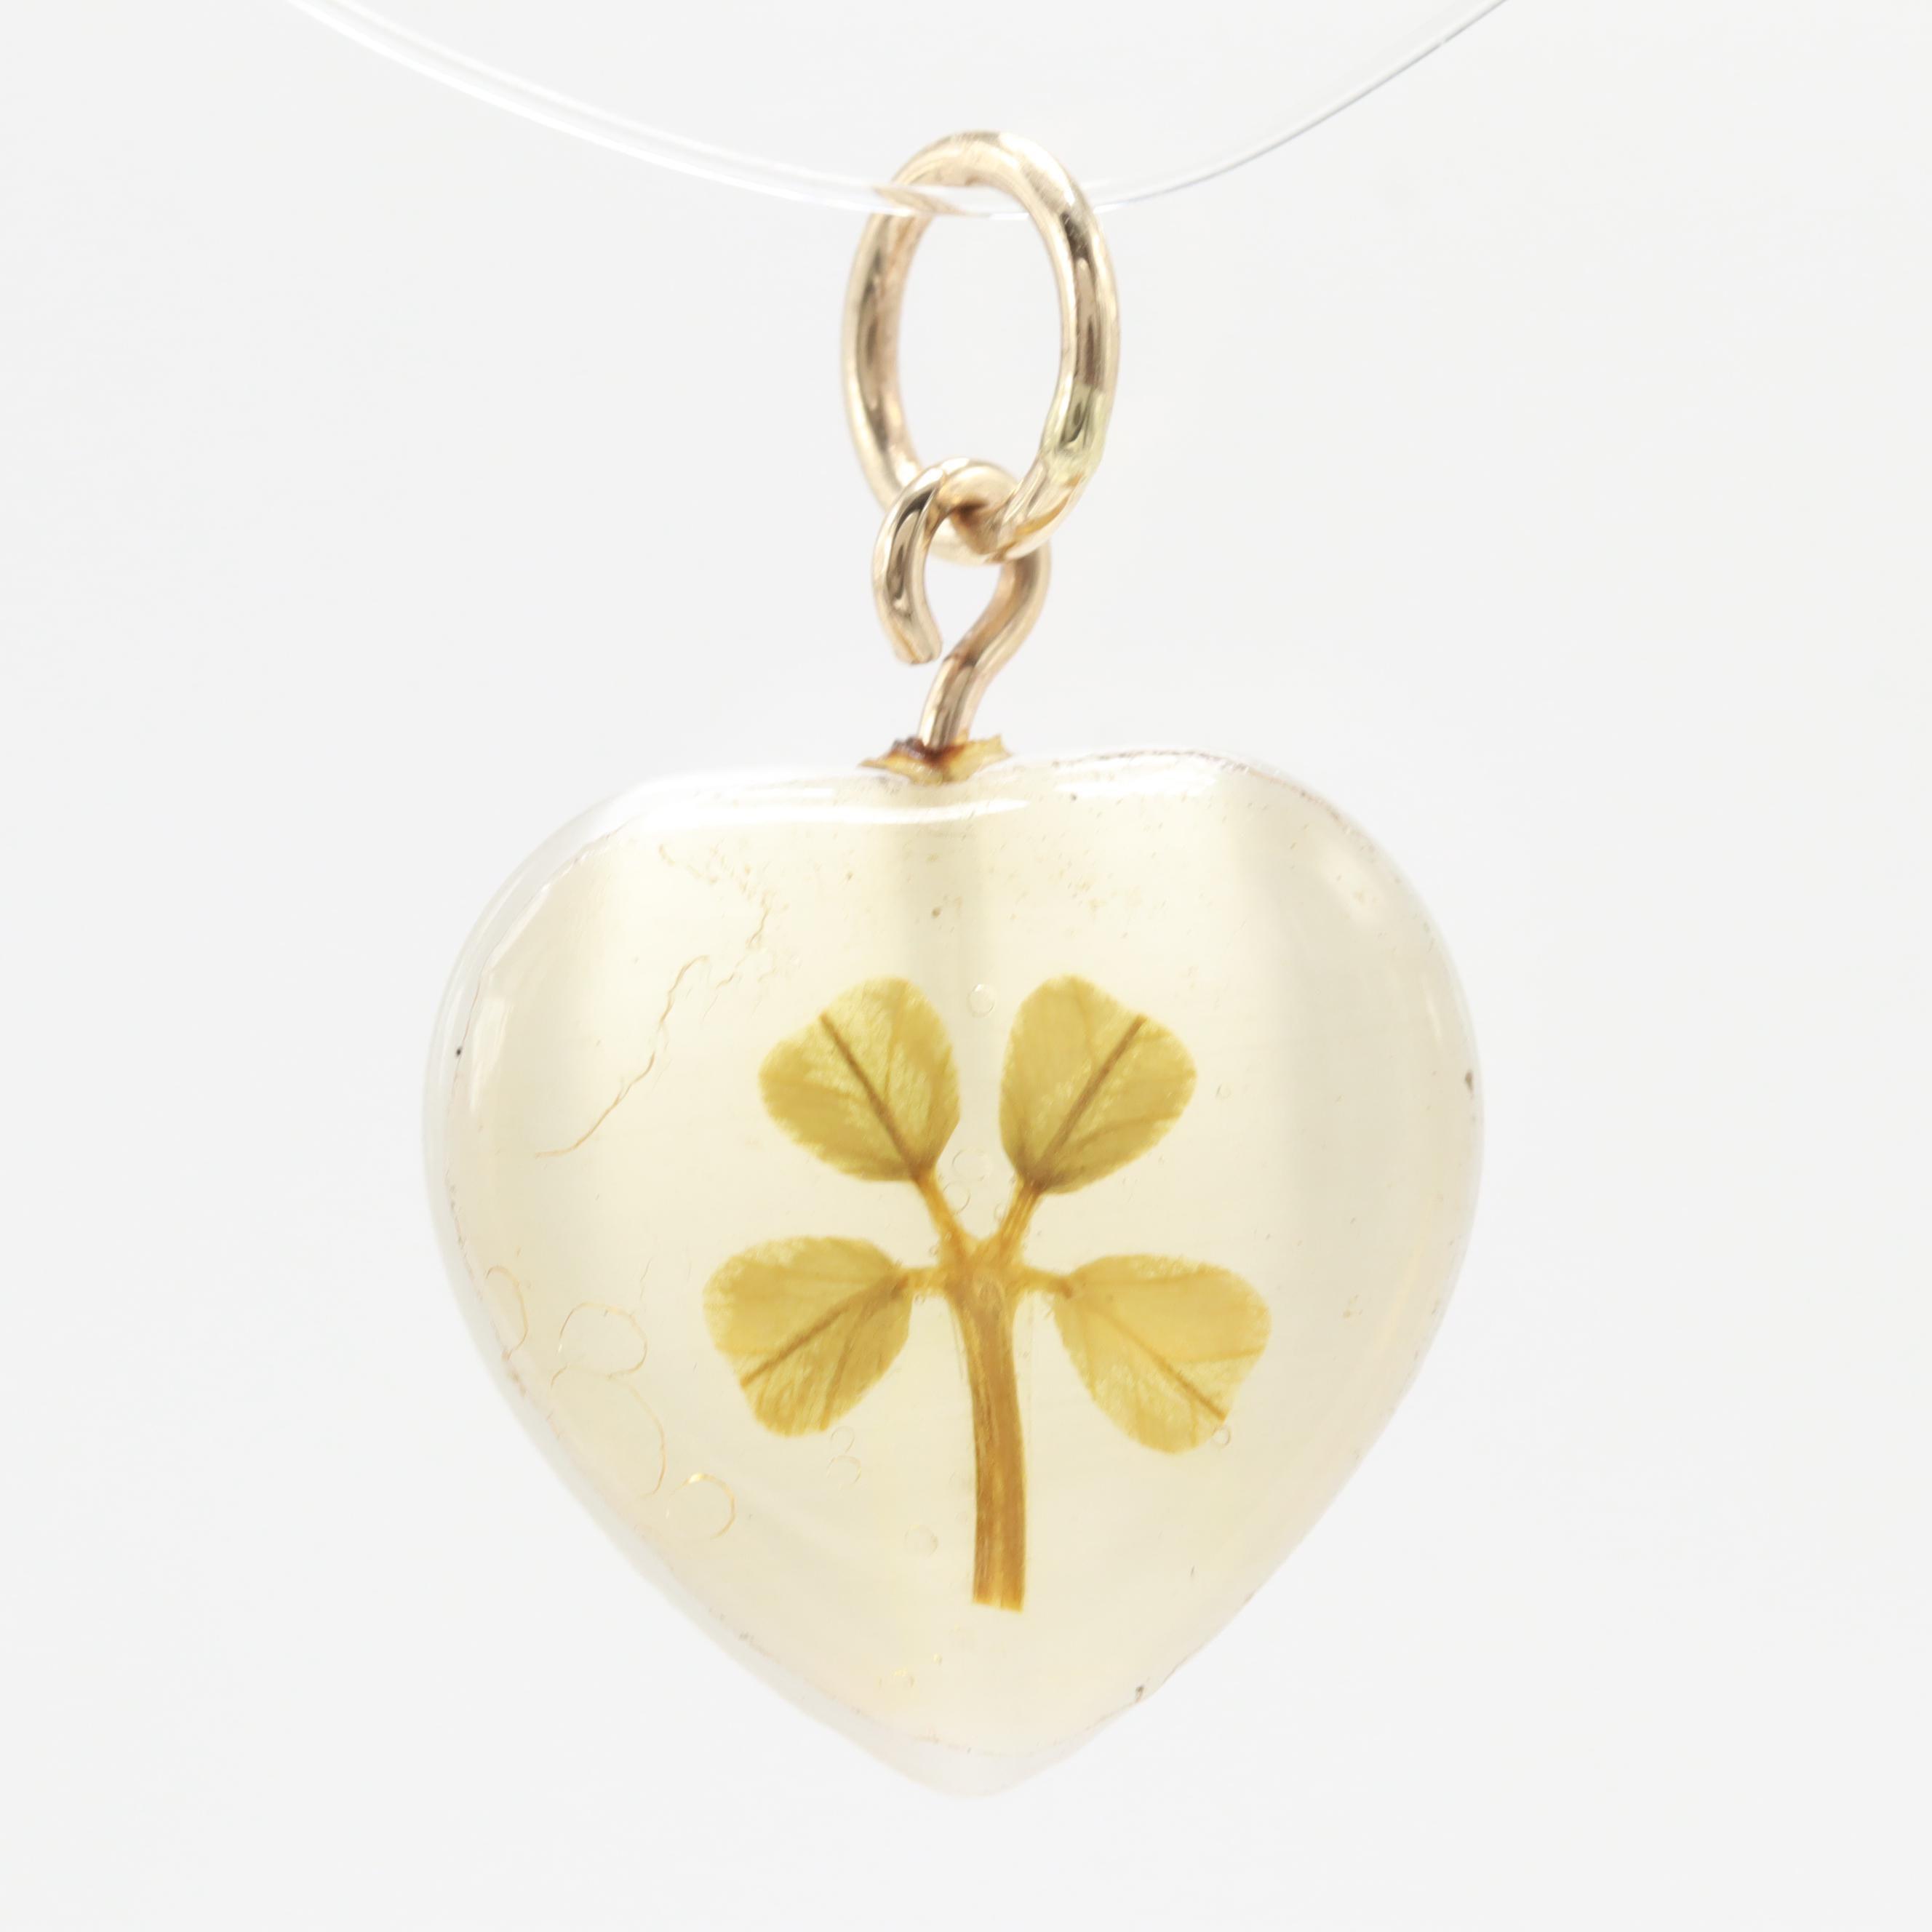 14K Yellow Gold Resin Heart Four Leaf Clover Pendant